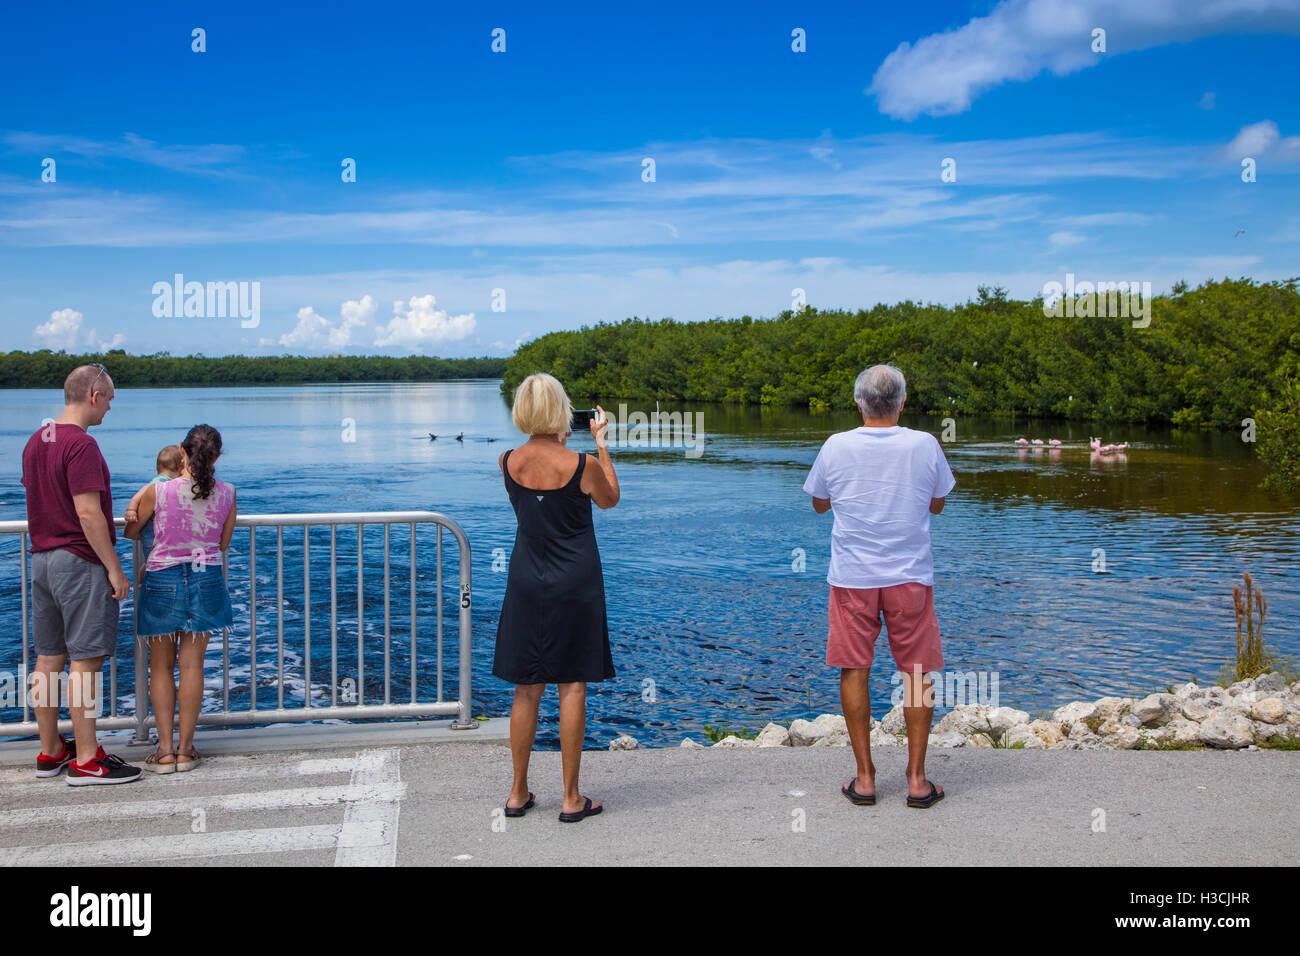 People veiwing birds in J N Ding Darling National Wildlife Refuge on Sanibel Island Florida - Stock Image